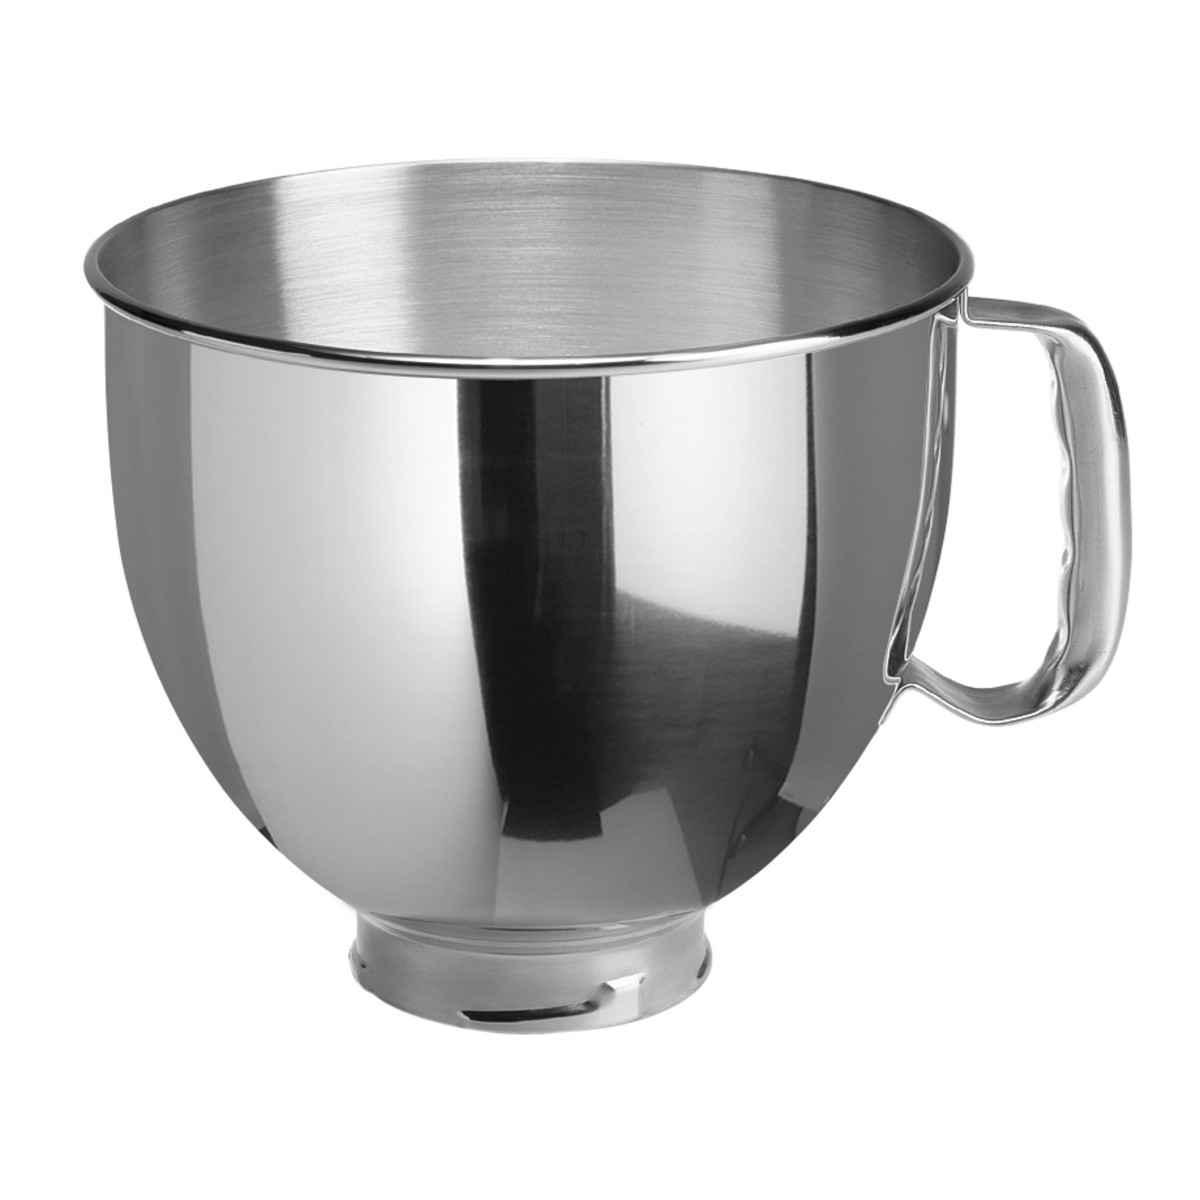 KitchenAid stainless steel bowls